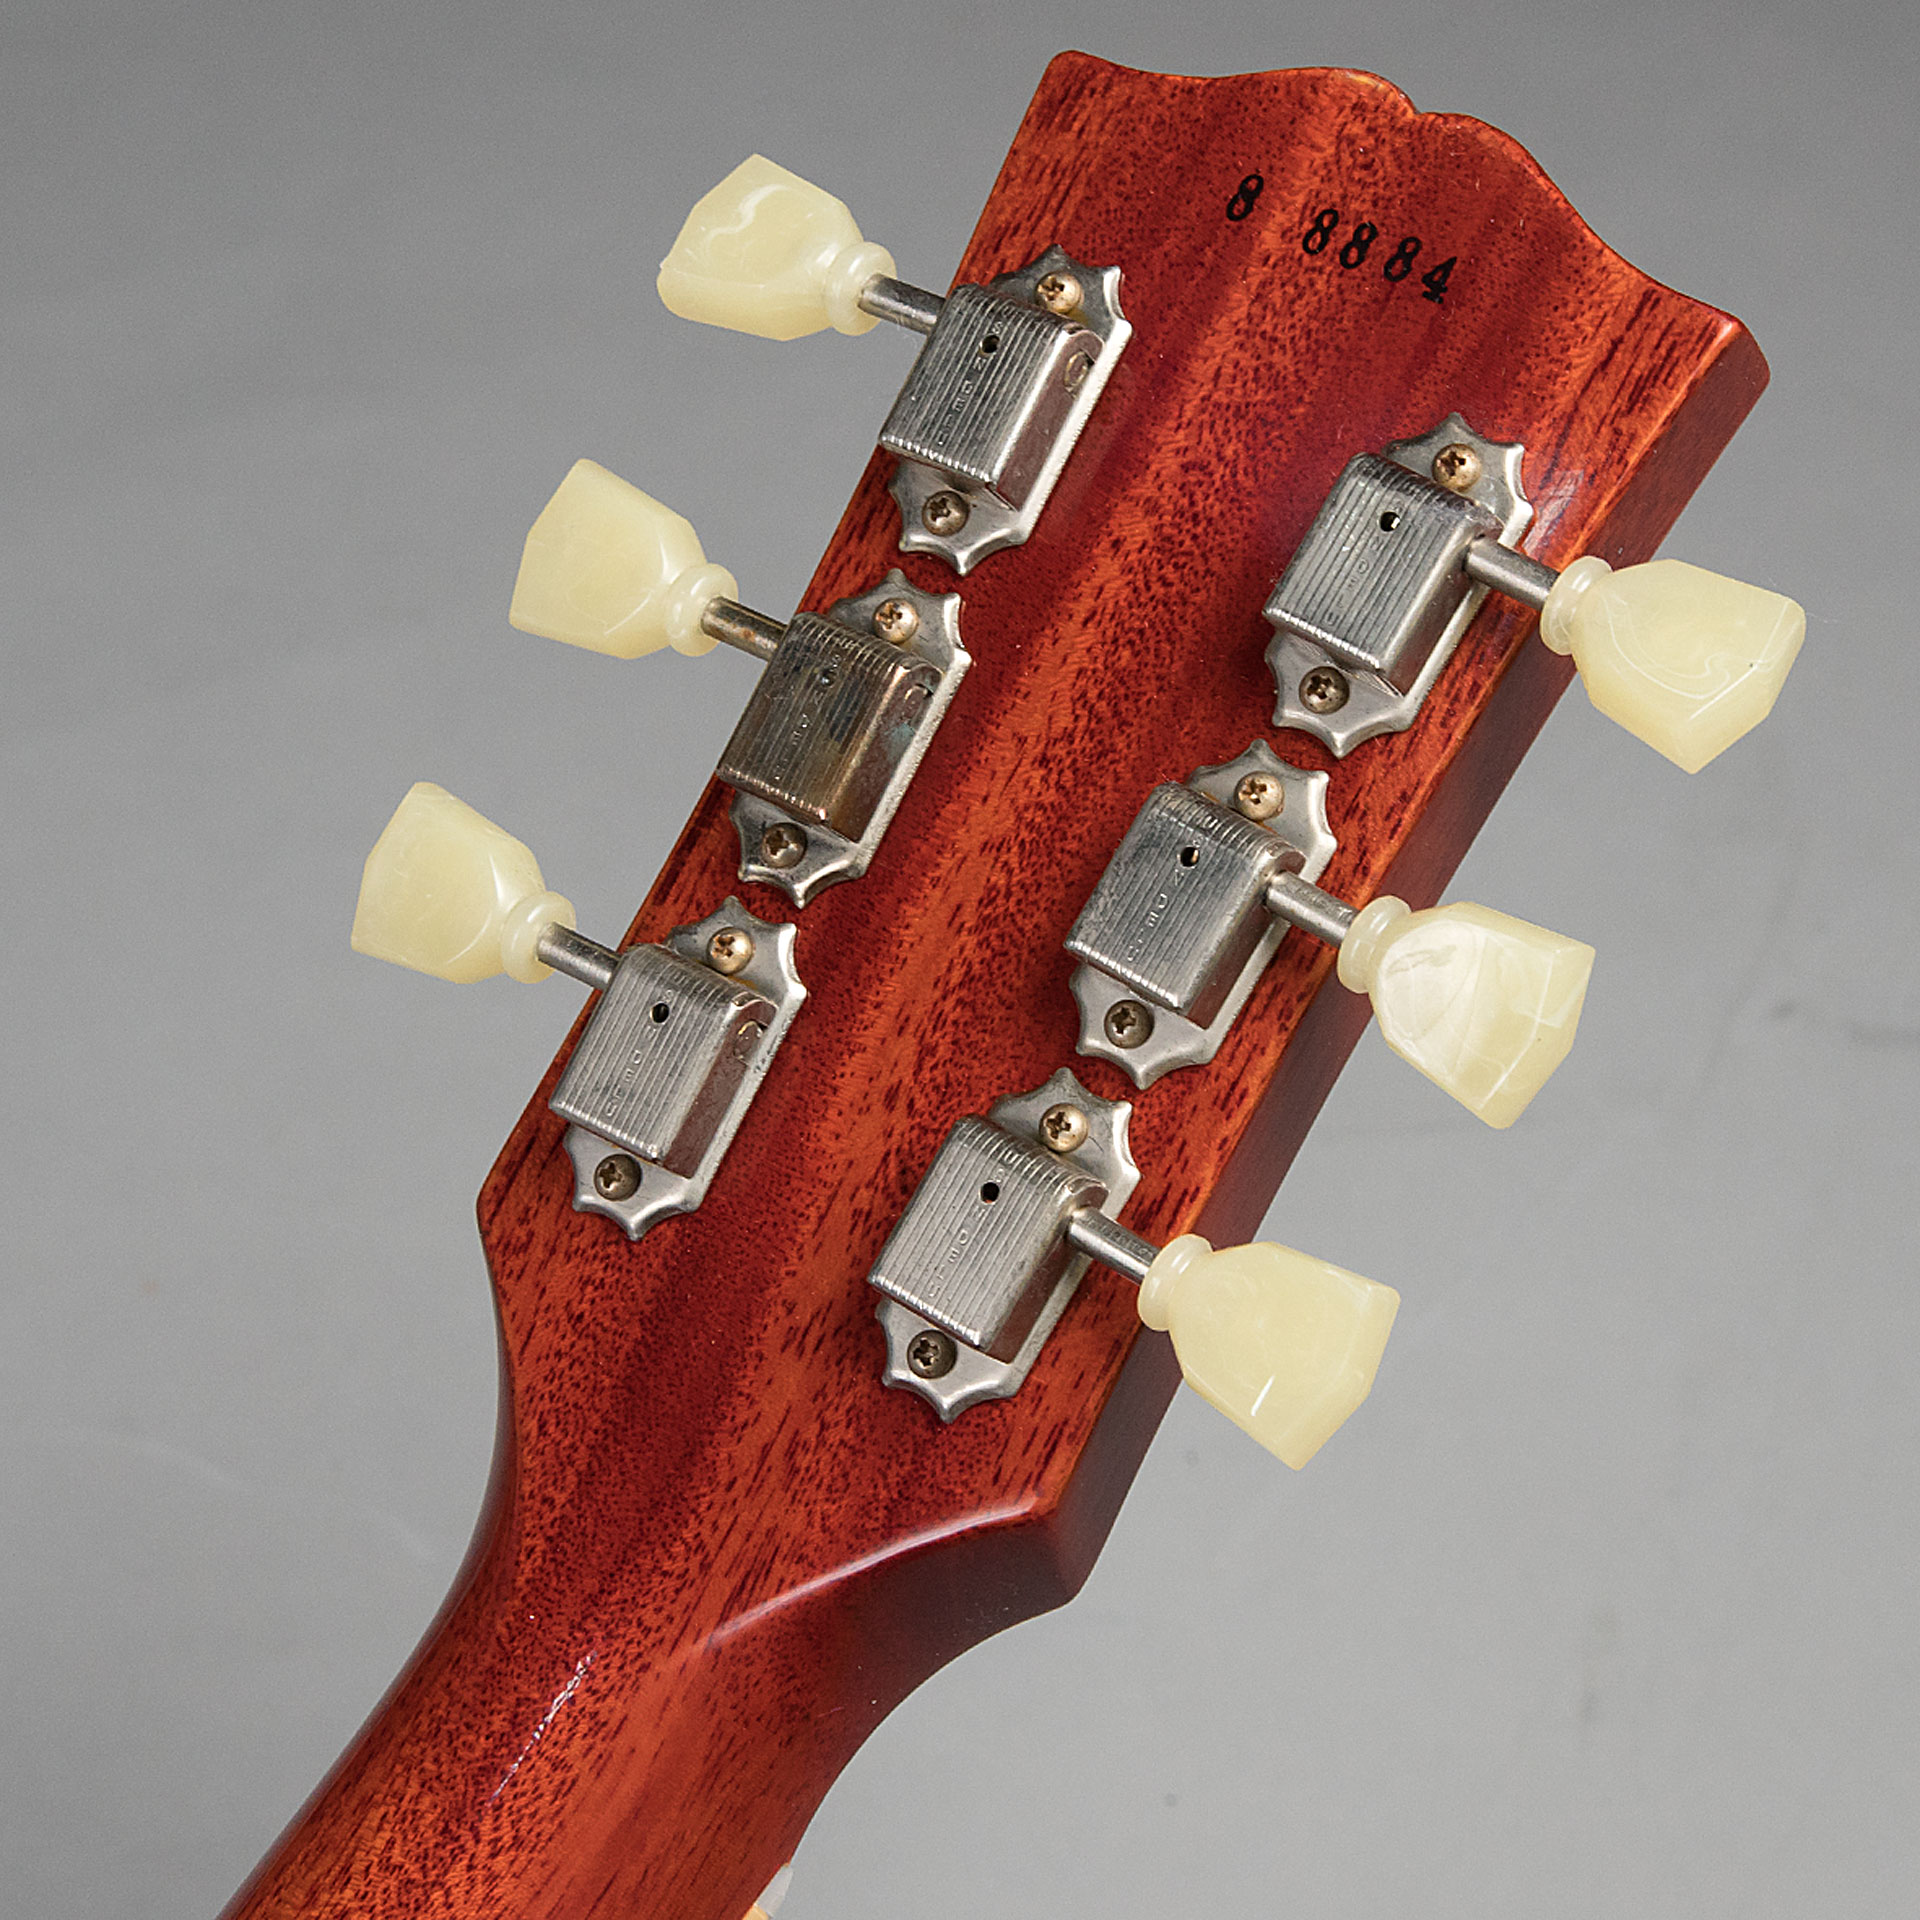 1958 Les Paul Standard Hard Rock Maple VOSのヘッド裏-アップ画像